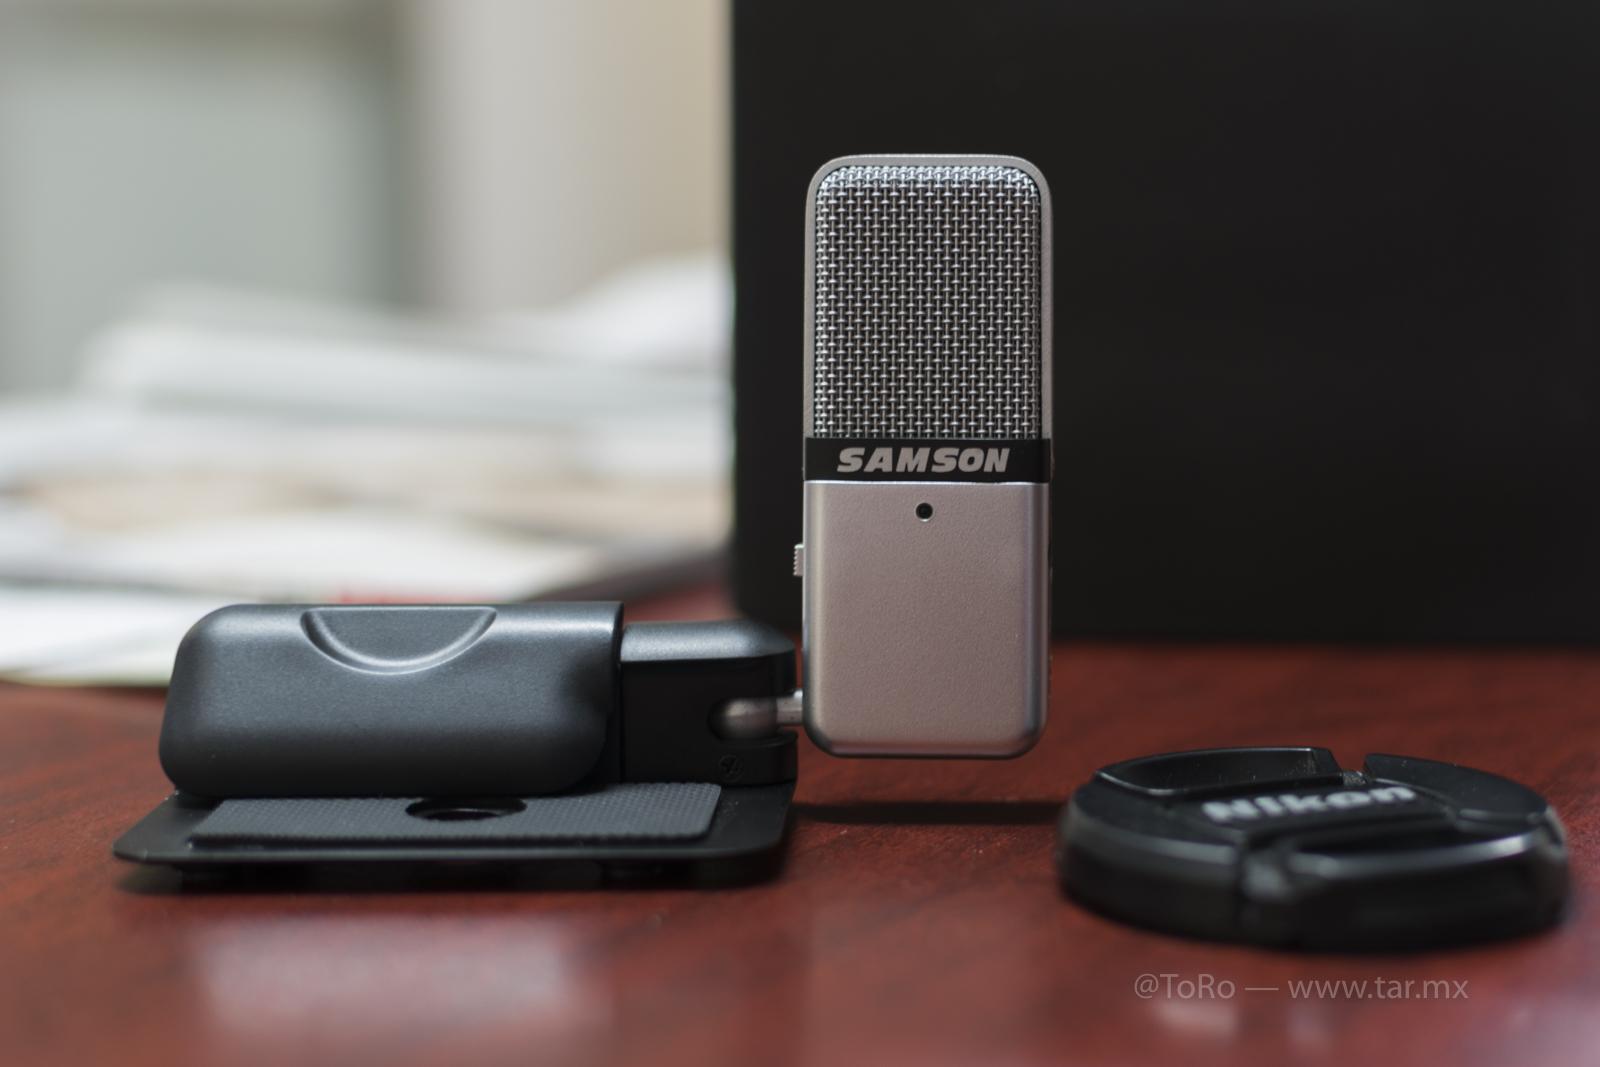 Micrófono Samson Go Mic adquirido en Amazon MX